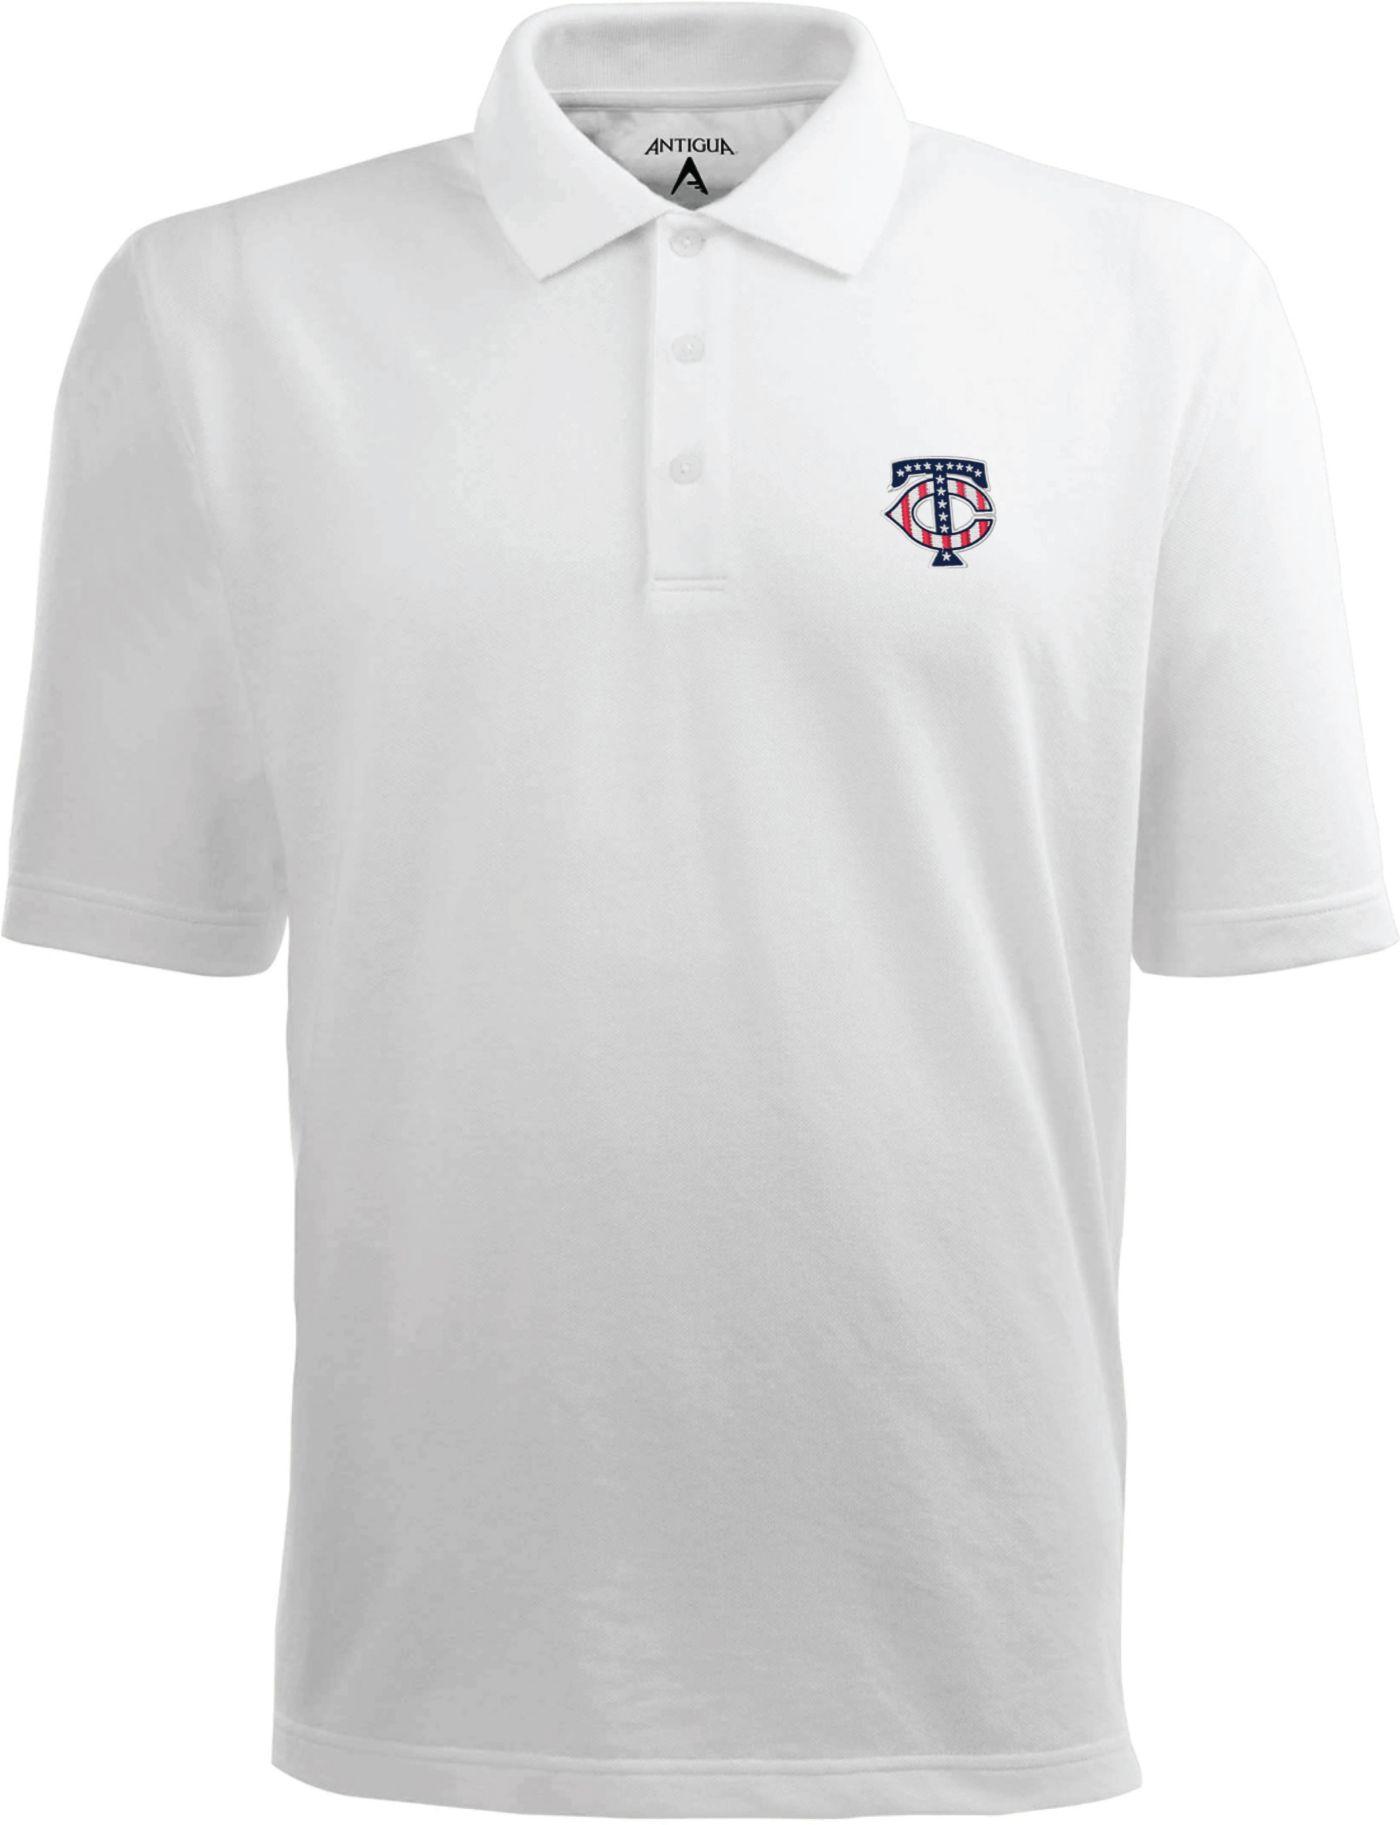 Antigua Men's Minnesota Twins Xtra-Lite Patriotic Logo White Pique Performance Polo